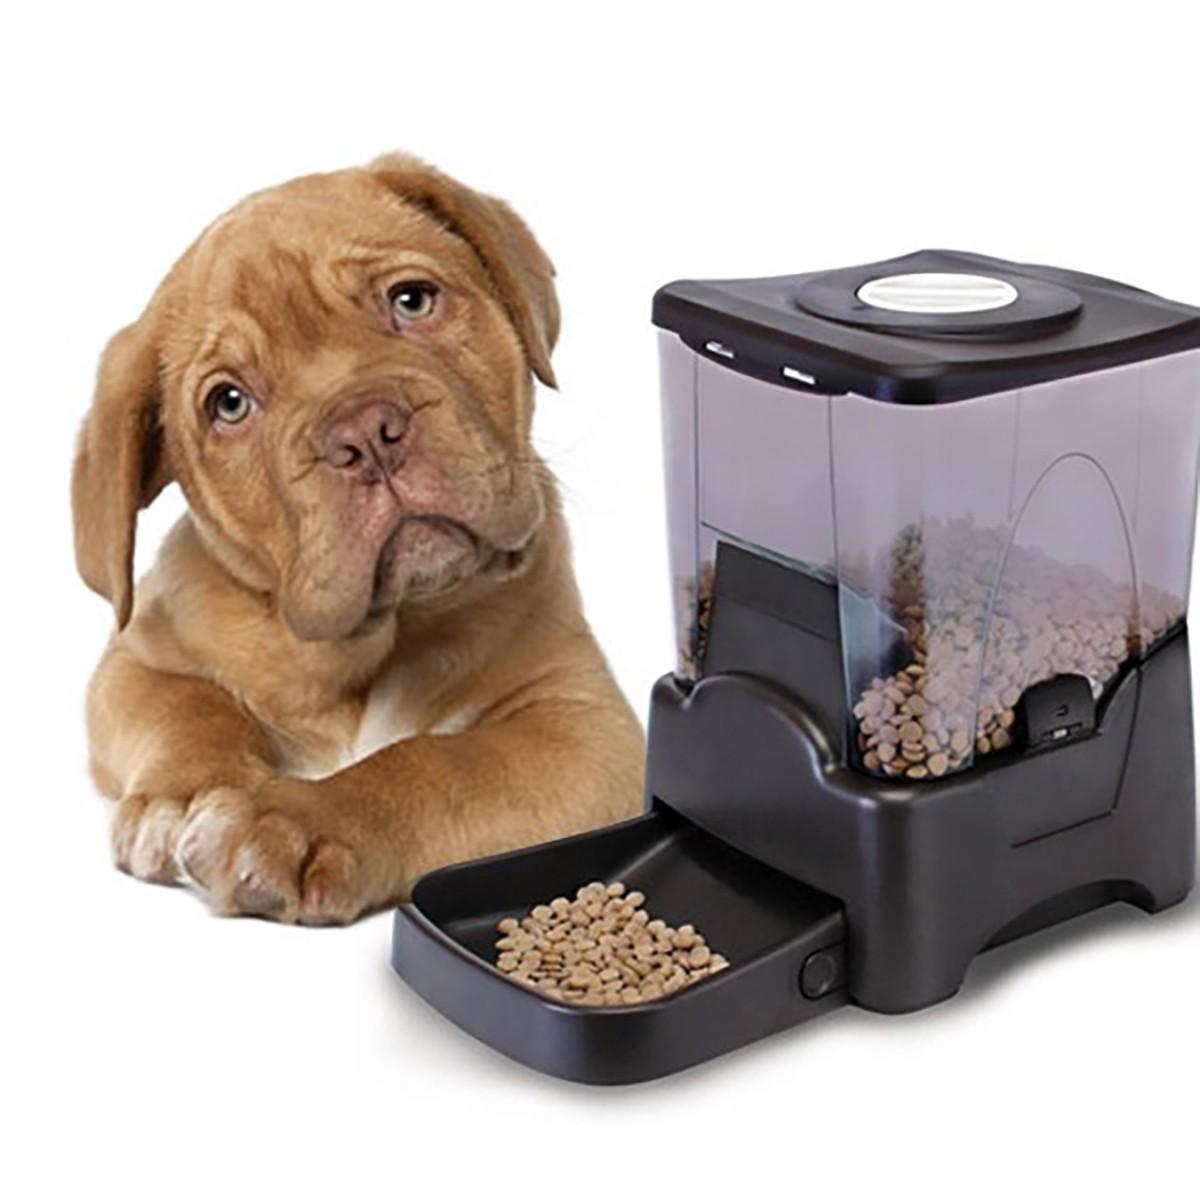 Dispensador autom tico y programable de alimentos para for Dispensador de comida para perros